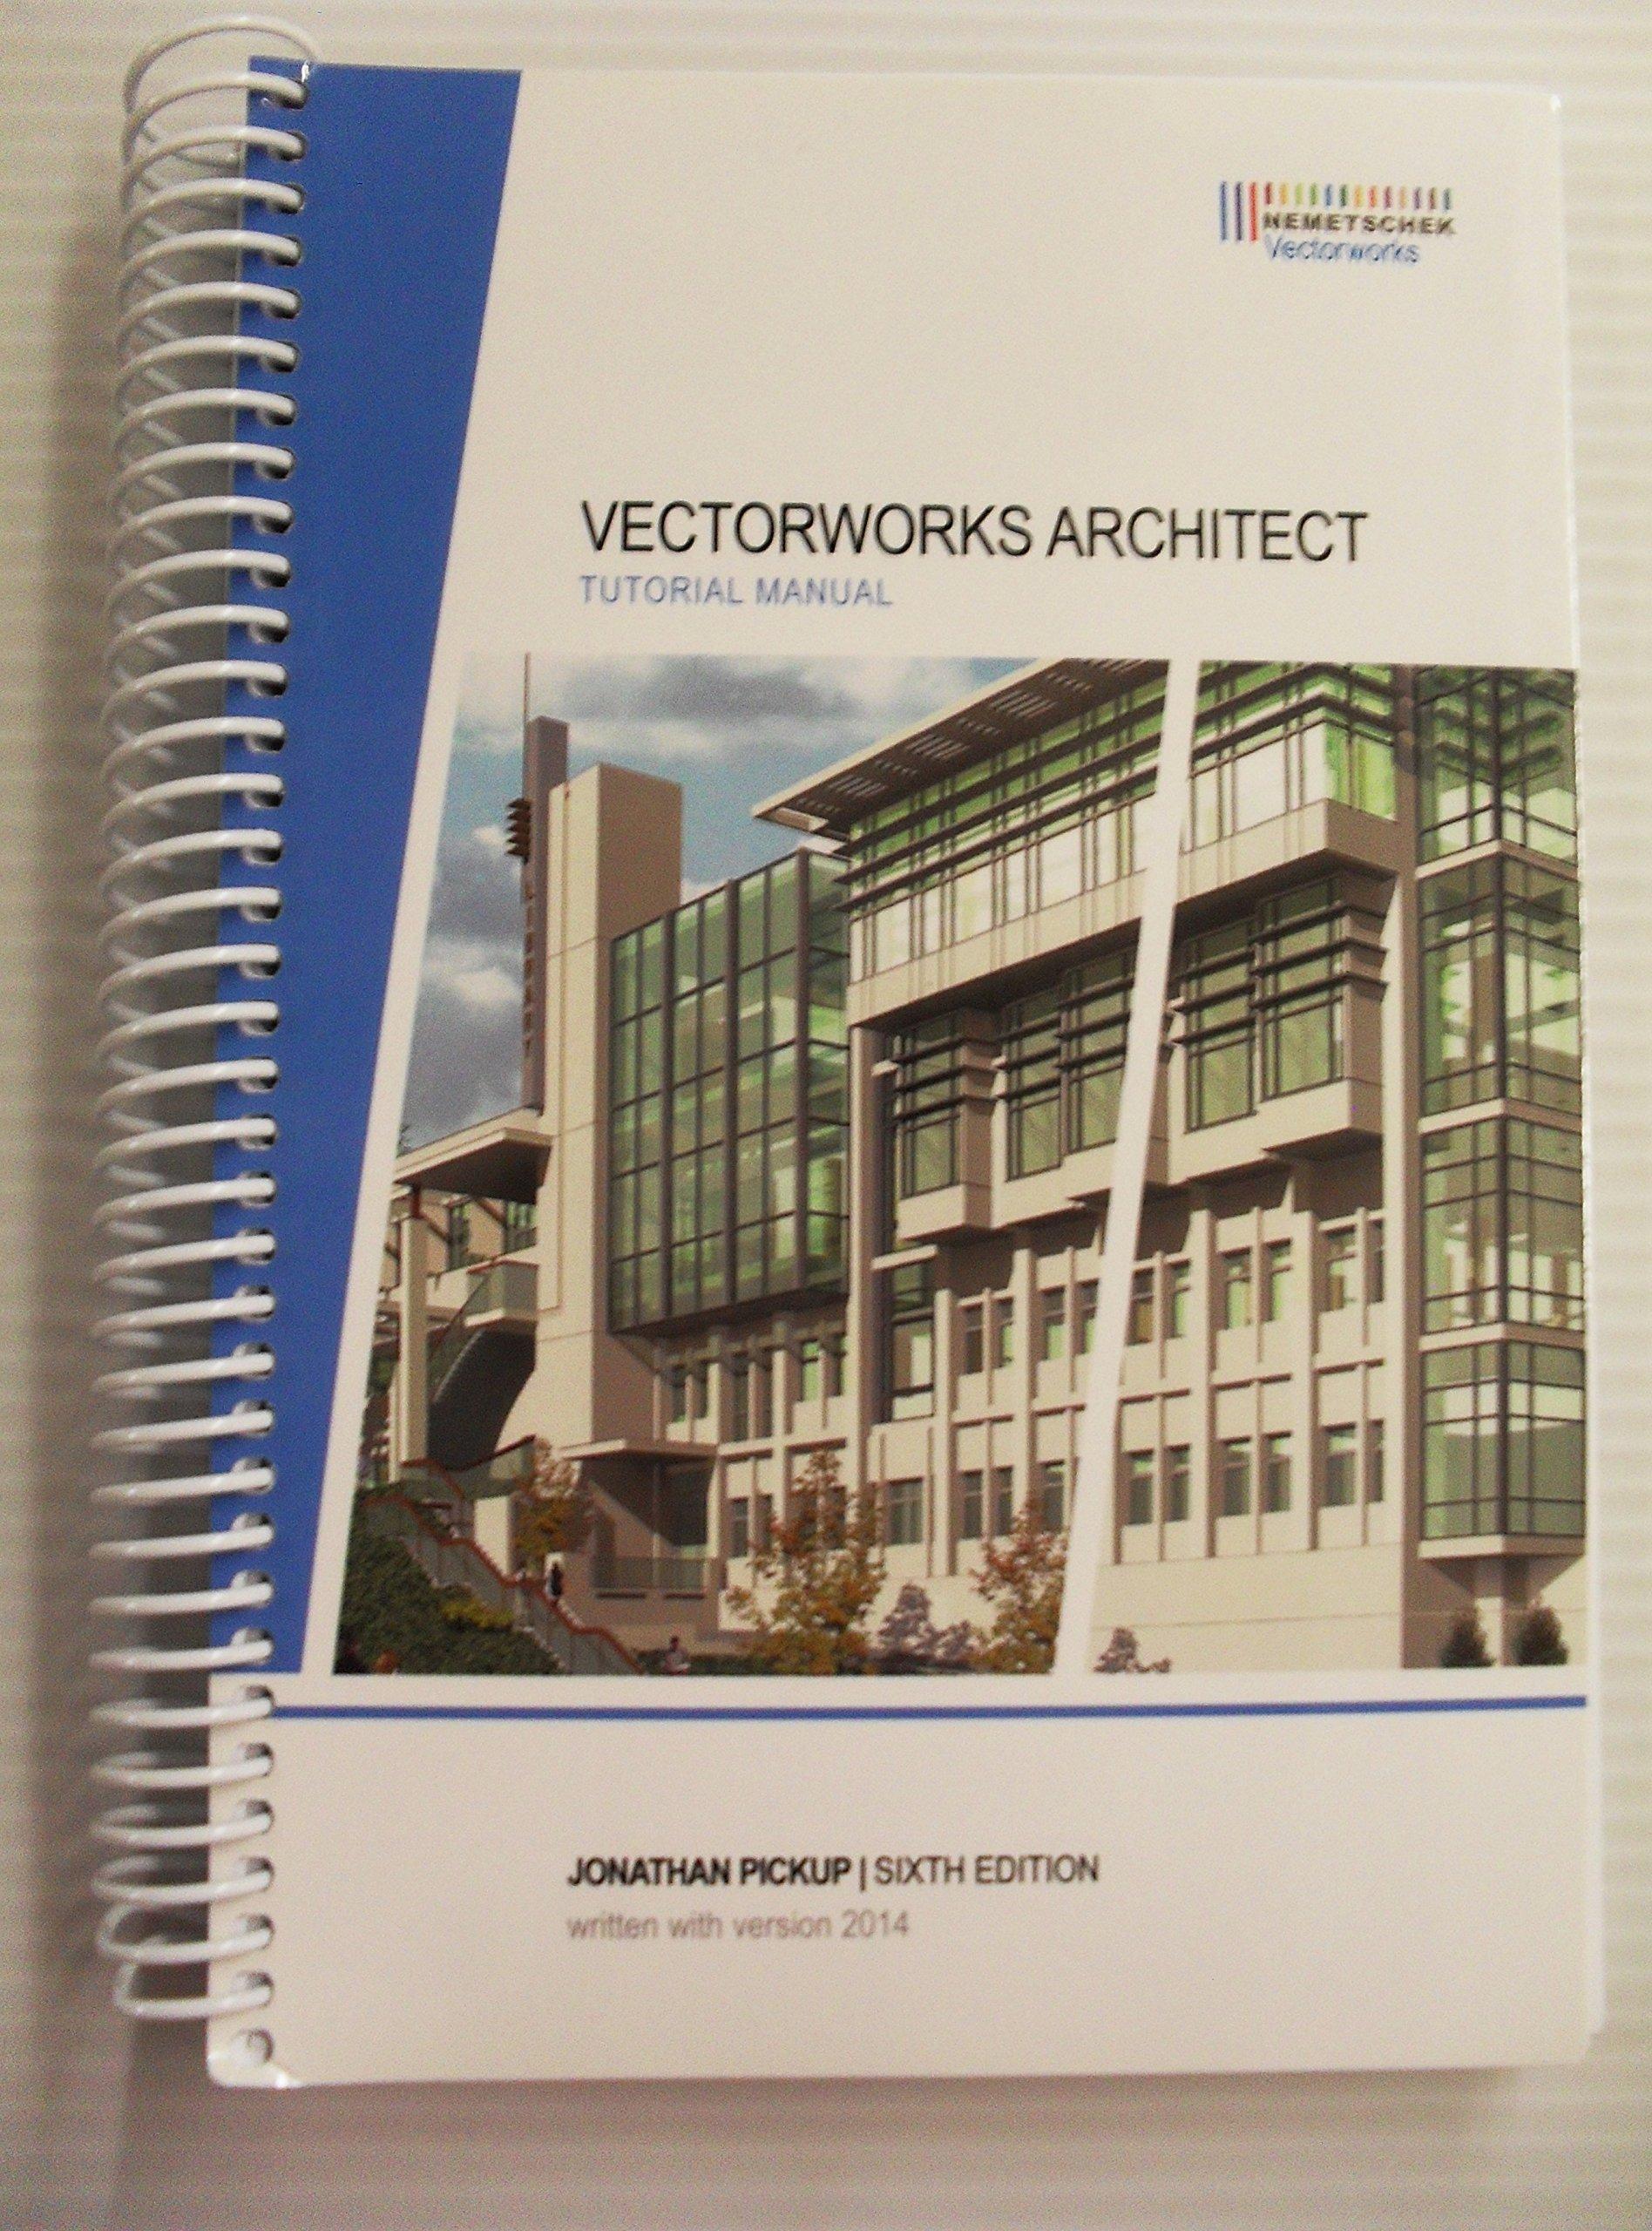 vectorworks architect tutorial manual sixth edition jonathan rh amazon com vectorworks architect tutorial manual pdf download vectorworks architect tutorial manual eighth edition pdf